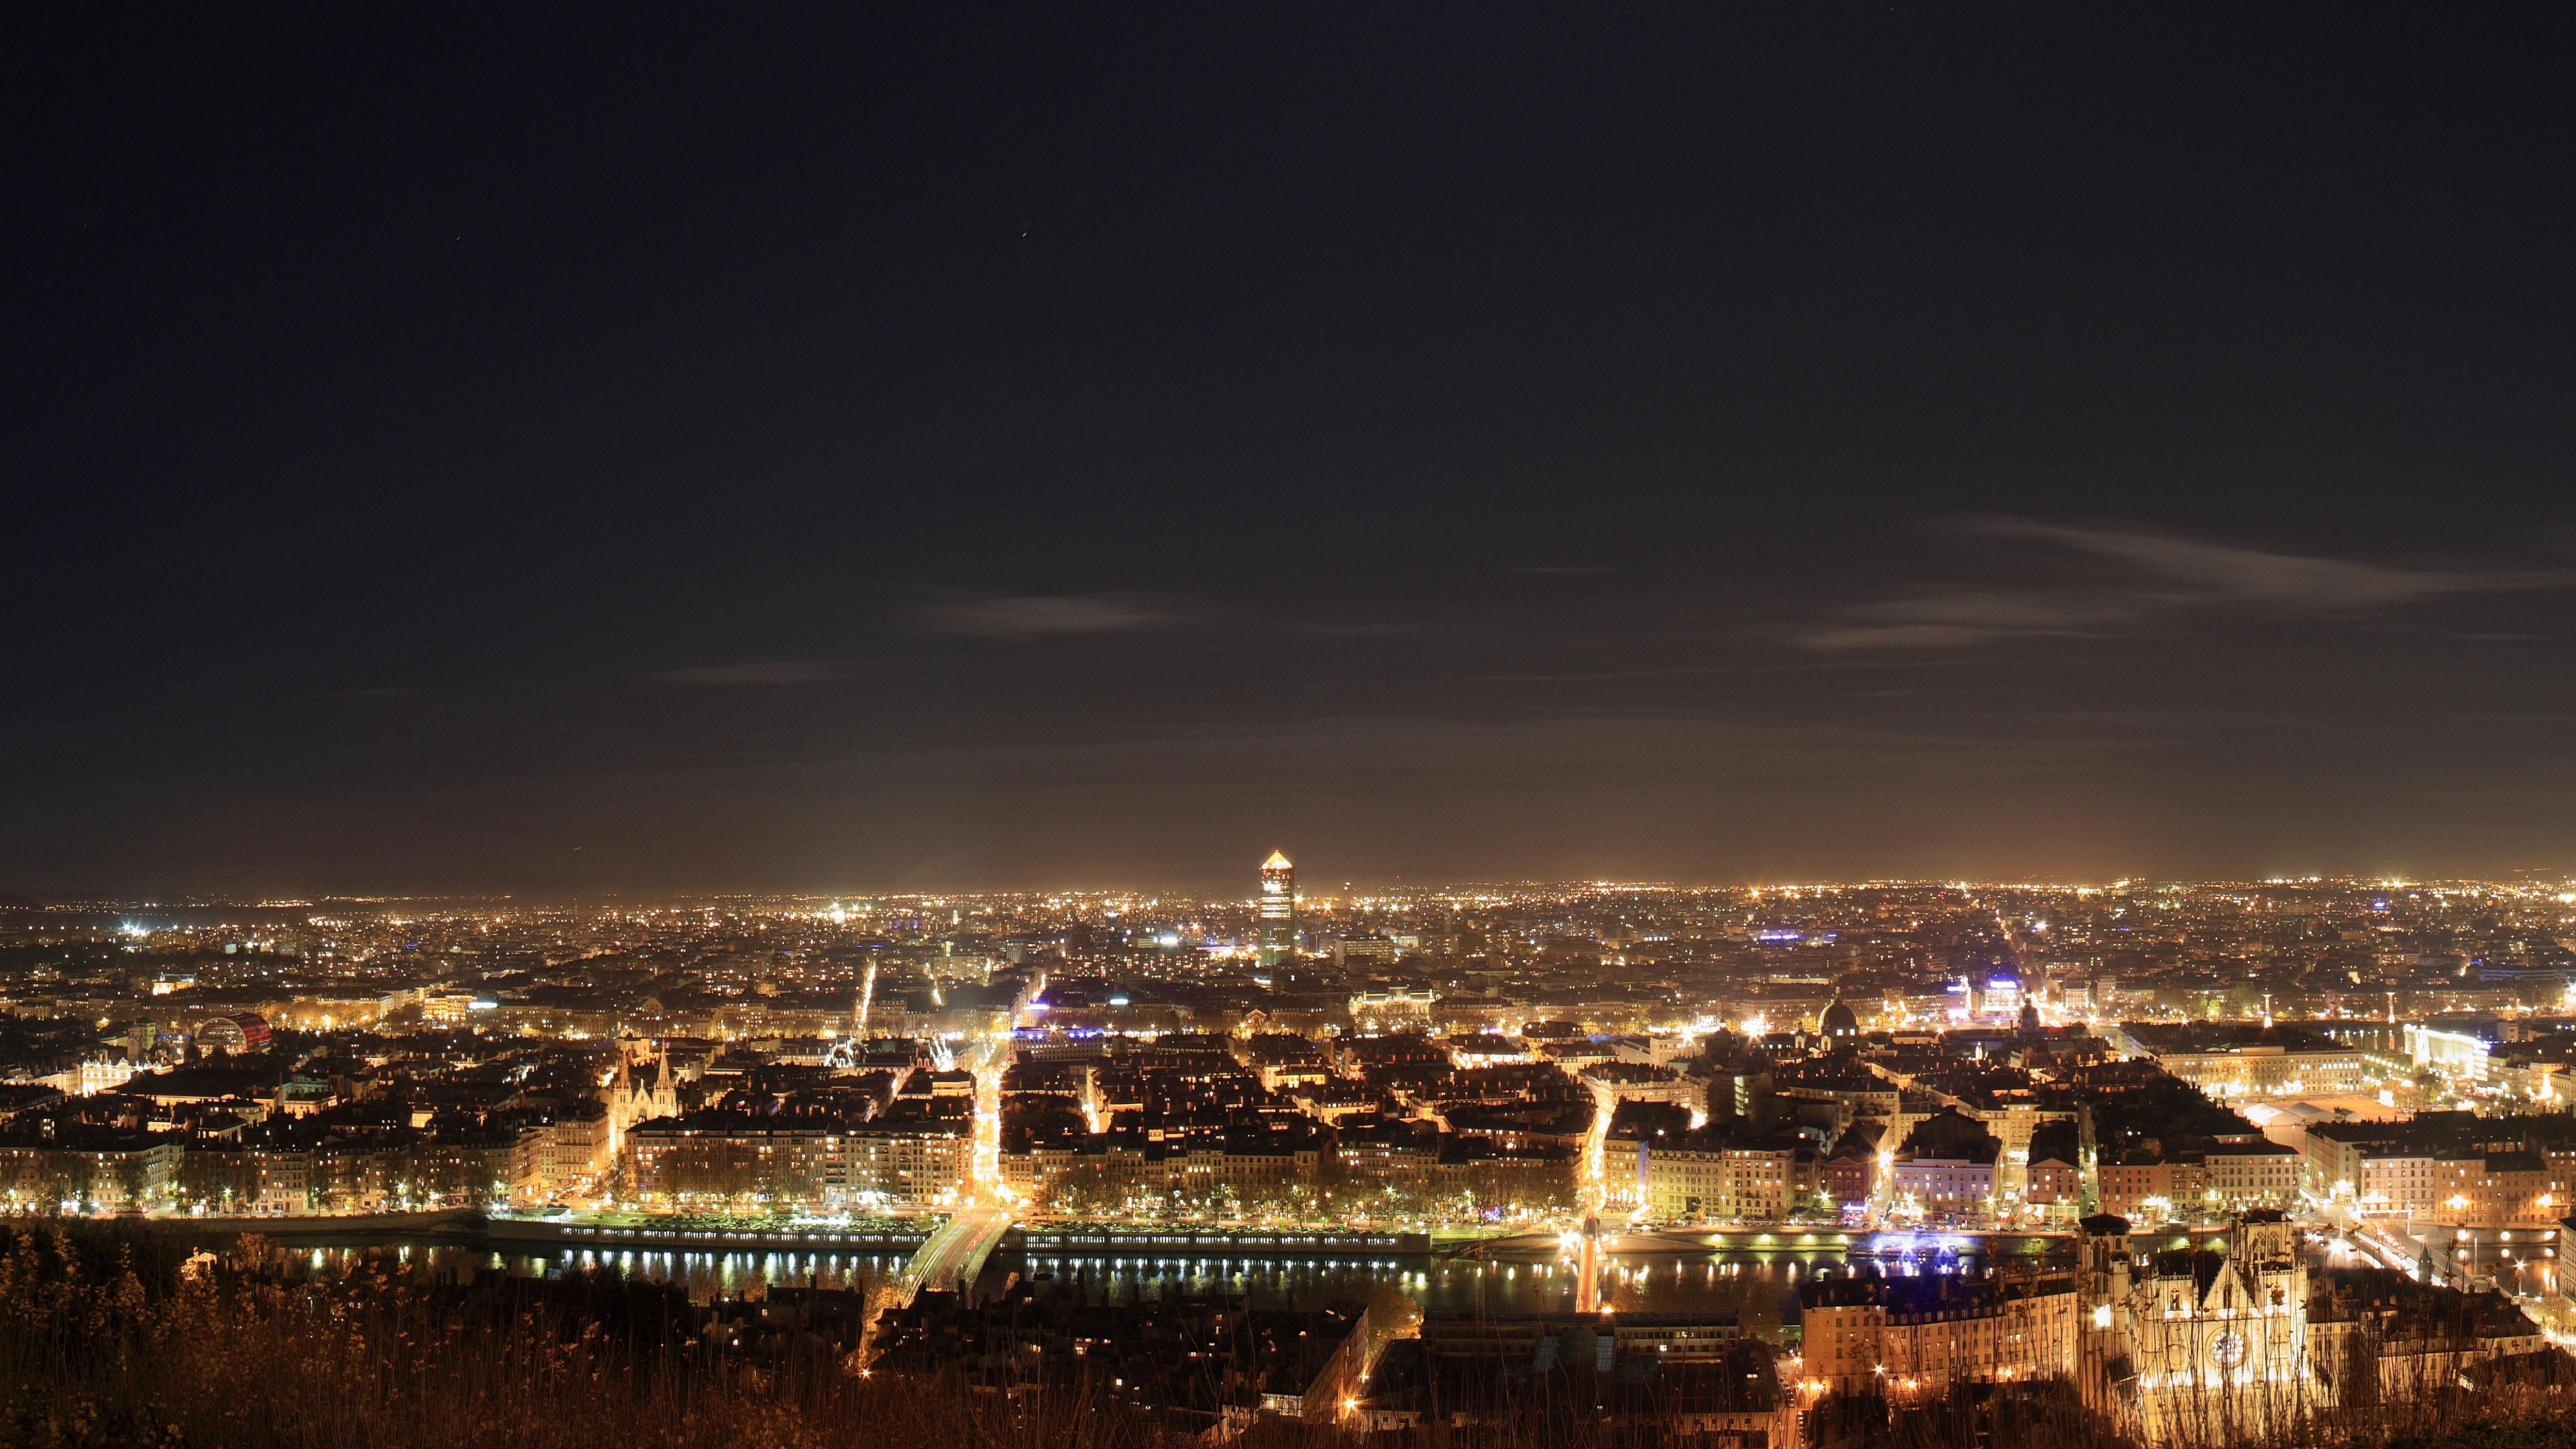 Lyon, France at Night wallpaper